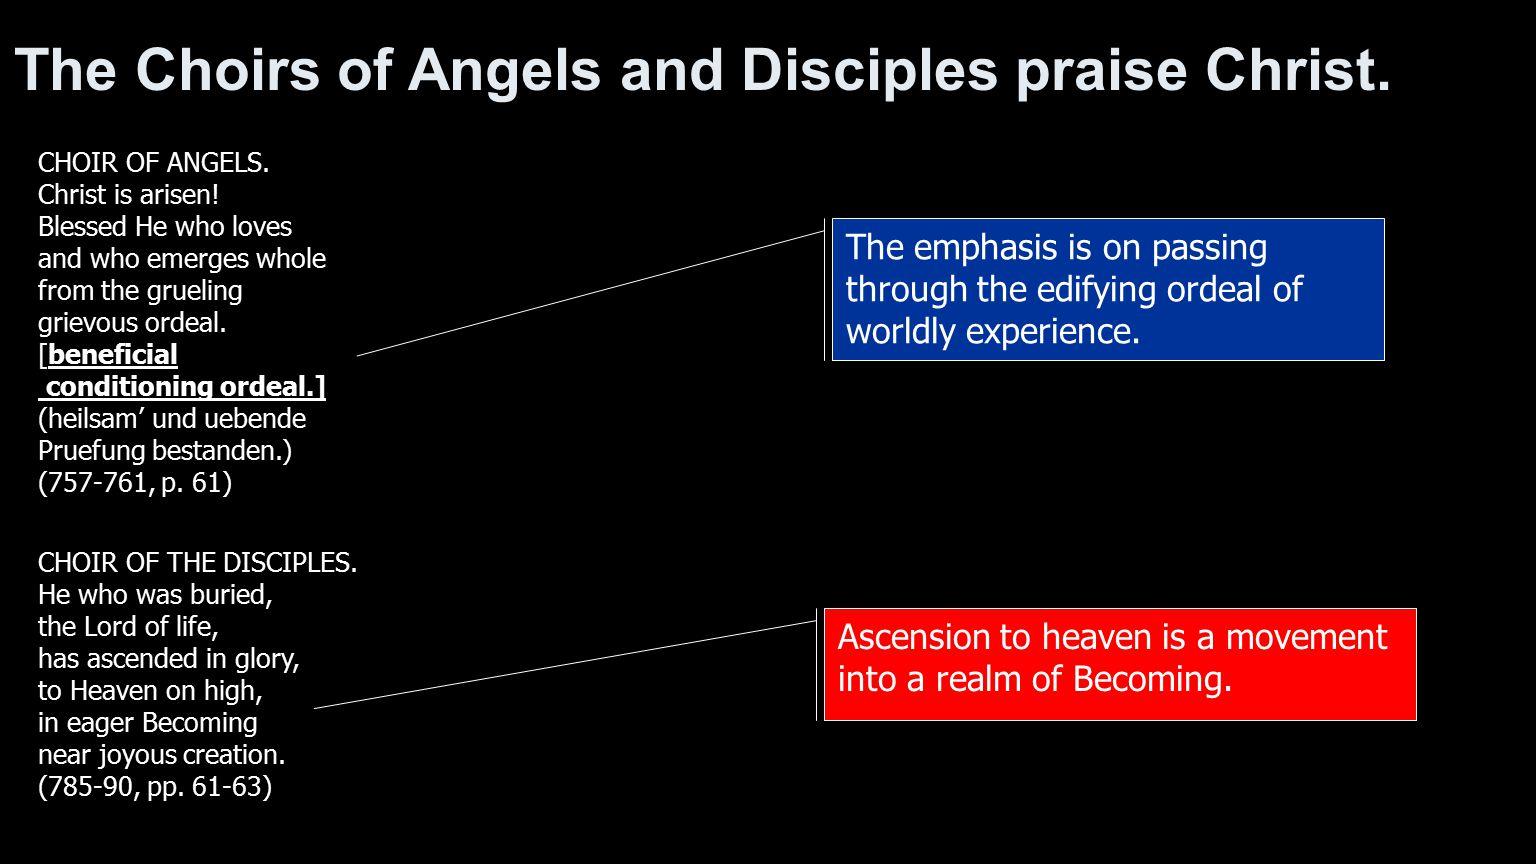 CHOIR OF THE DISCIPLES.